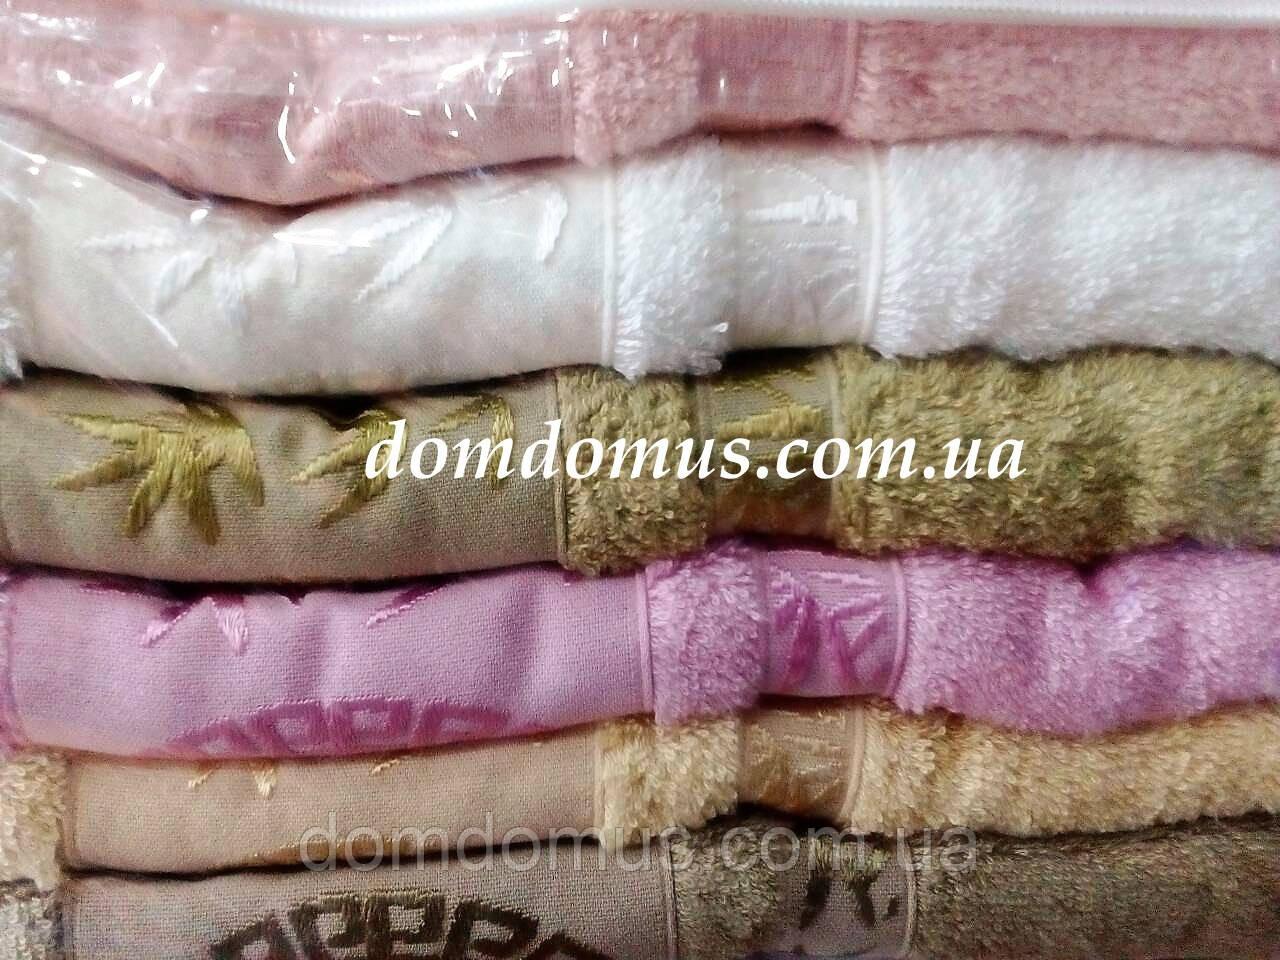 Махровое полотенце ( 100% бамбук) 70*140 Philippus 6 шт./уп.,Турция 021